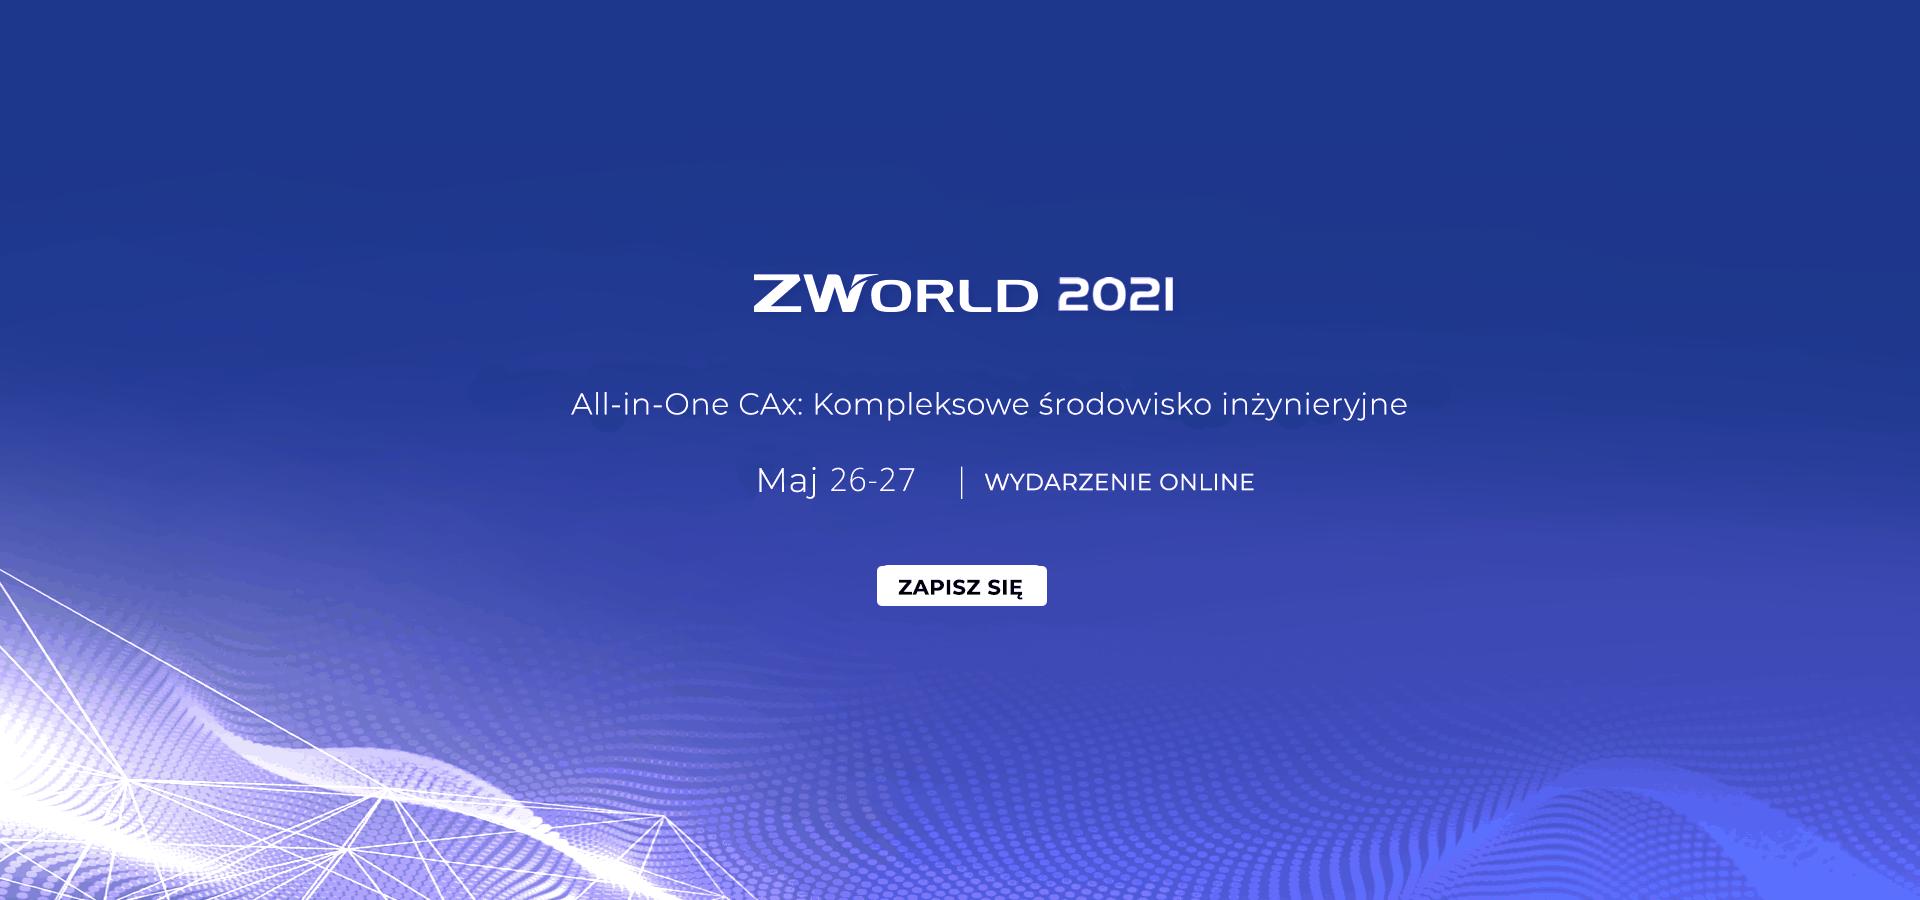 konferenecja zworld 2021